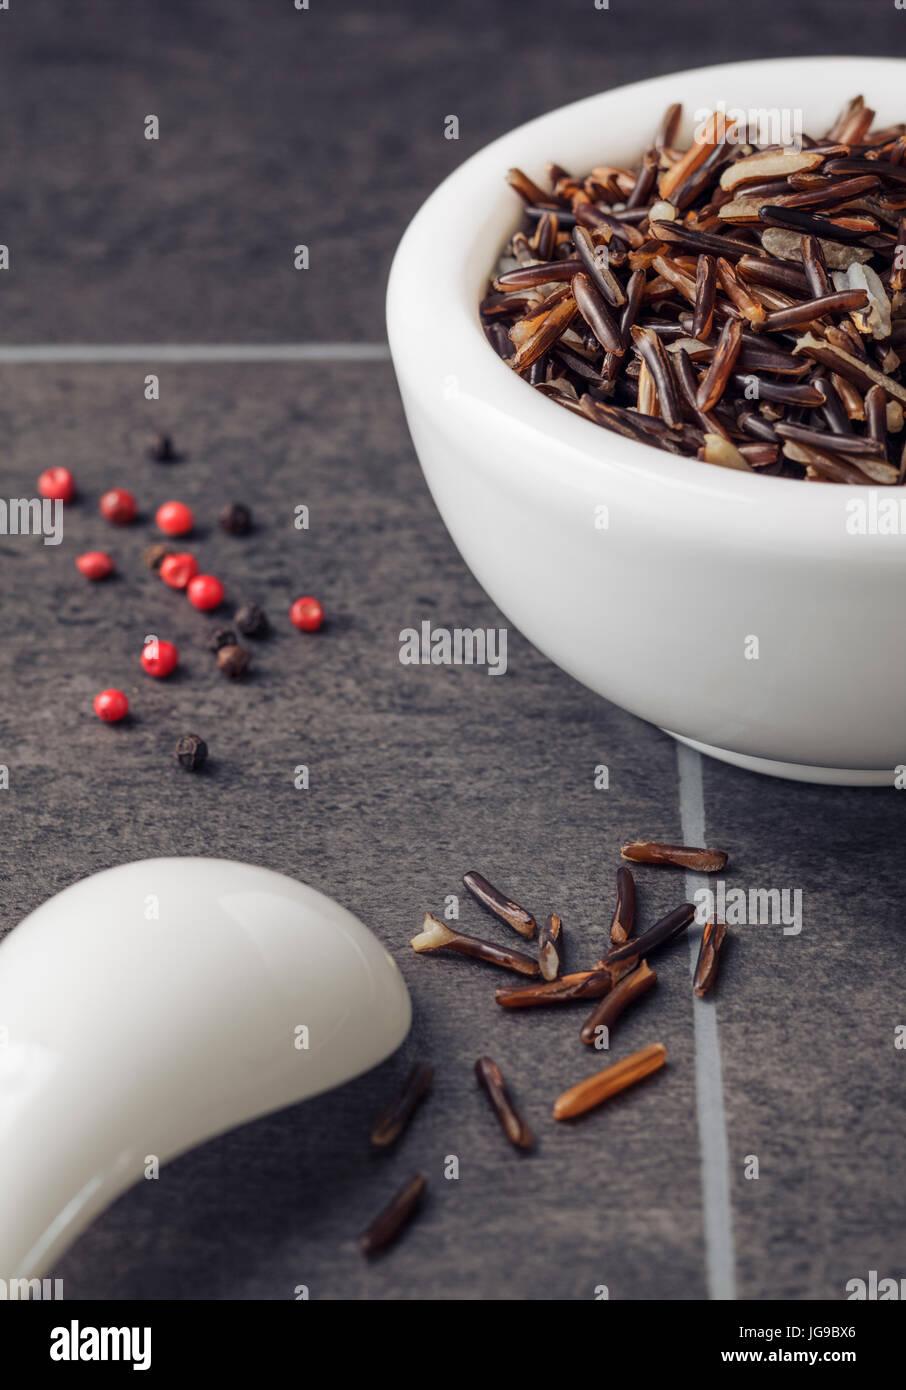 Wild Rice in white bowl - Stock Image